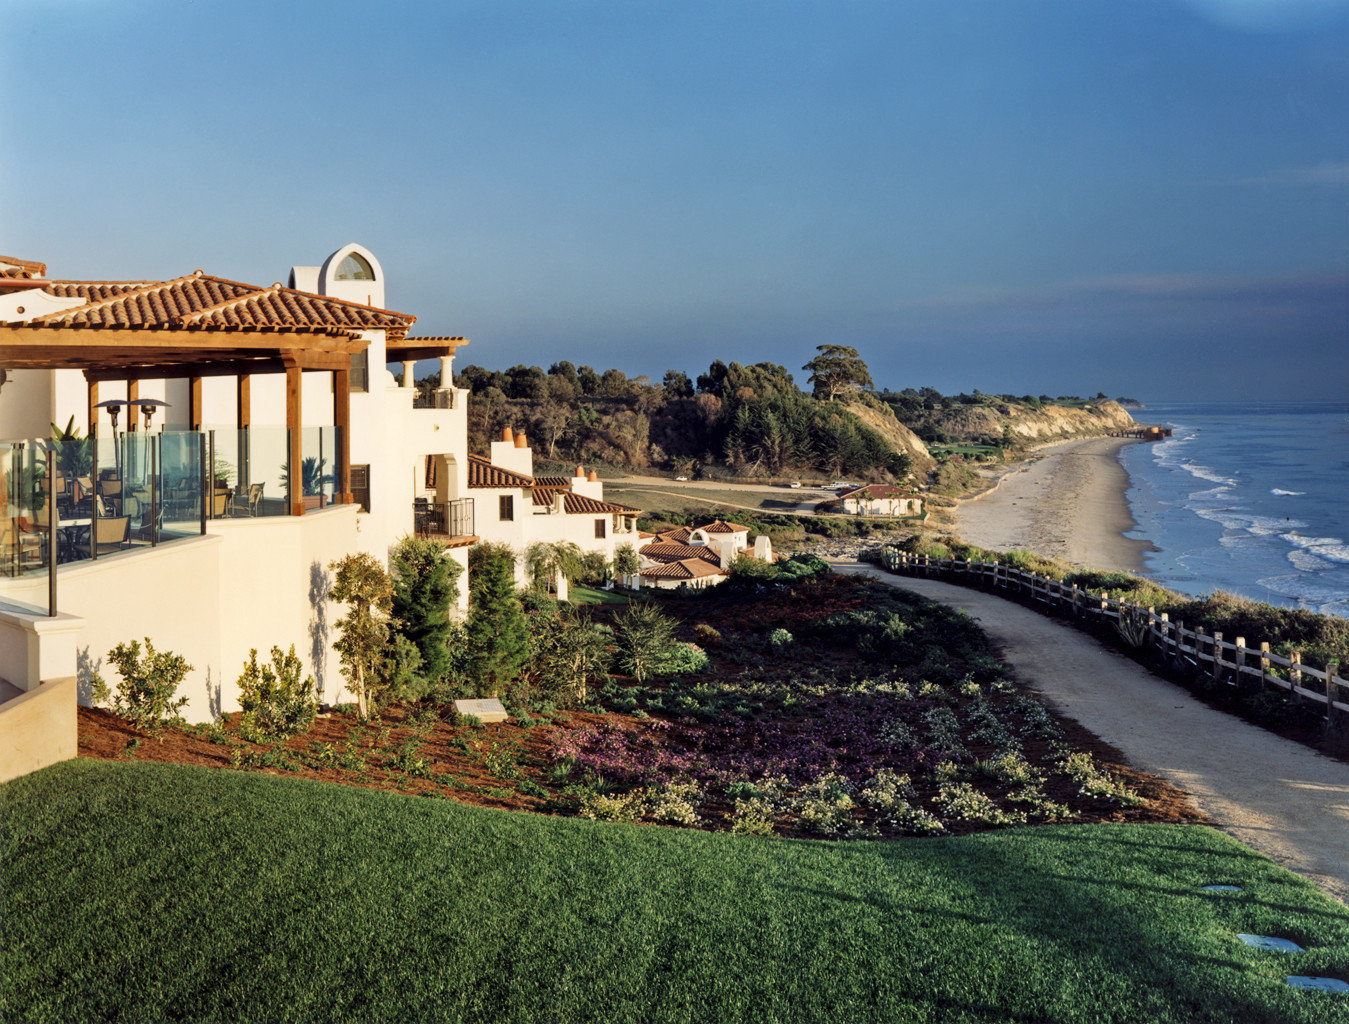 Food + Drink sky outdoor Coast estate vacation Sea aerial photography Beach Resort colonnade